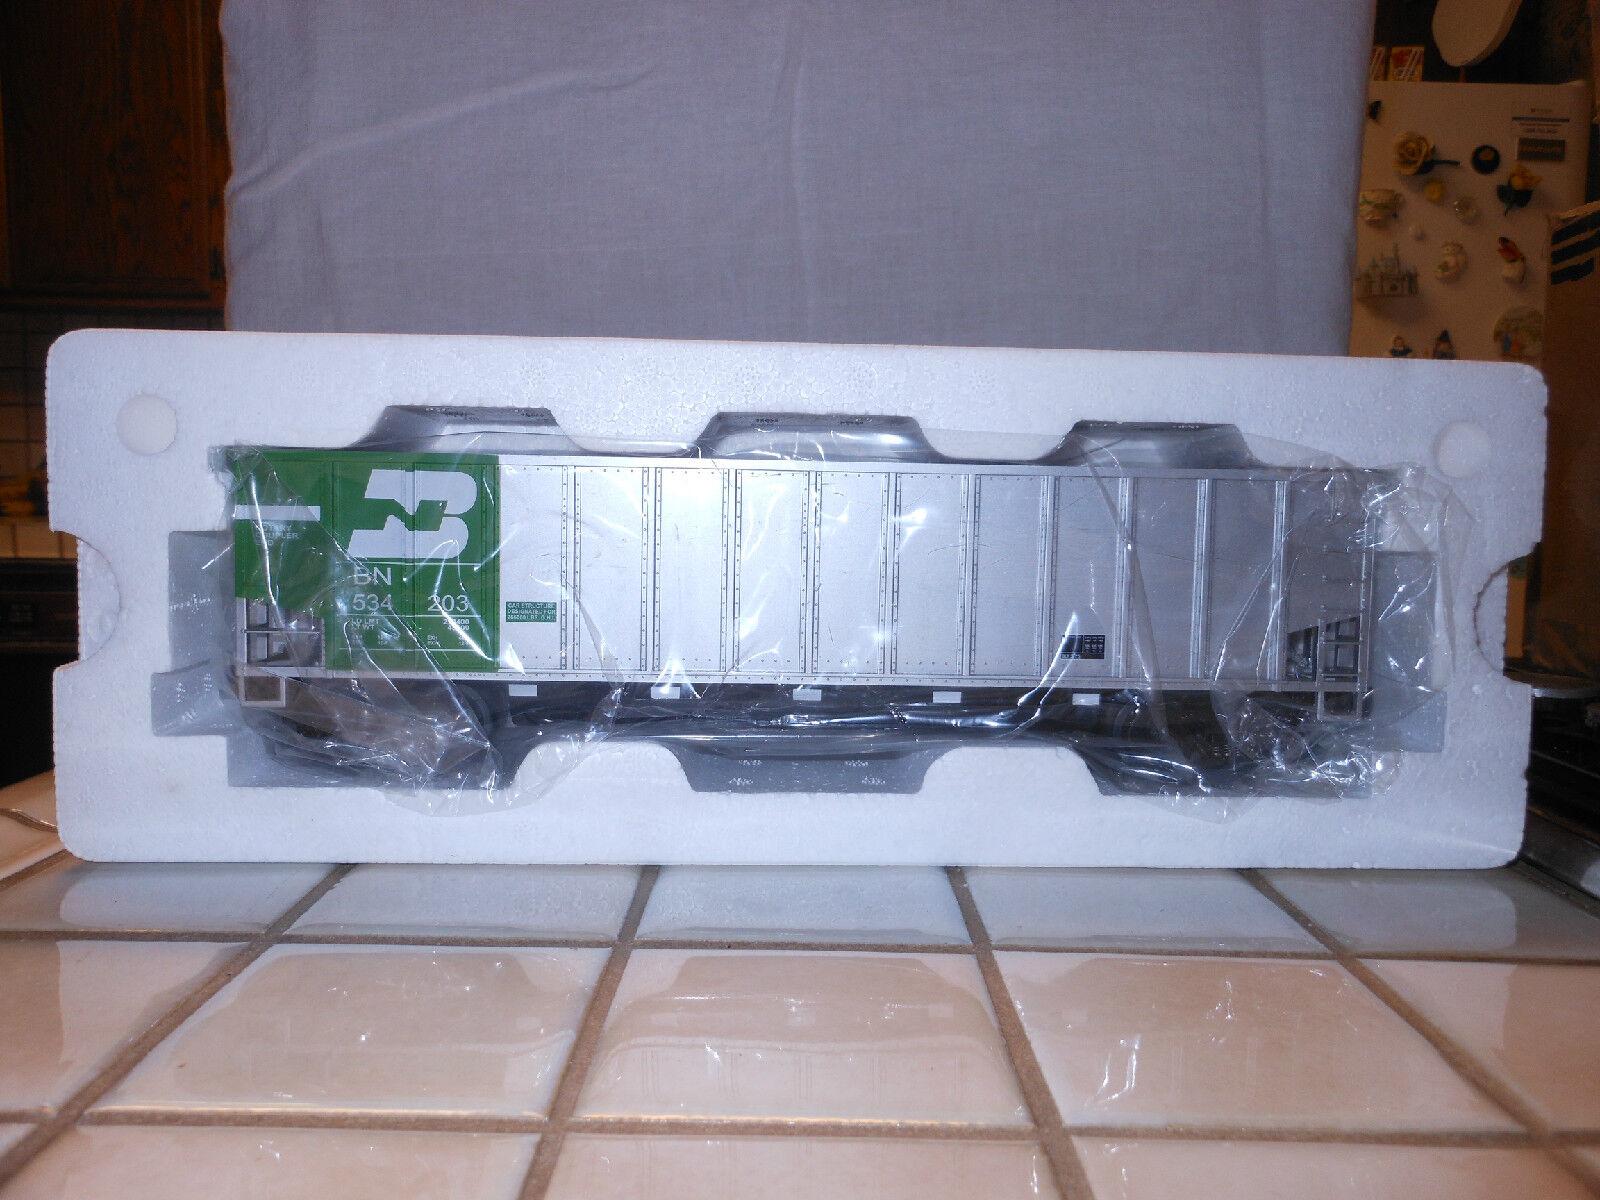 Mit premier 20-9701l burlington northern coalporter auto   534203 nib c9